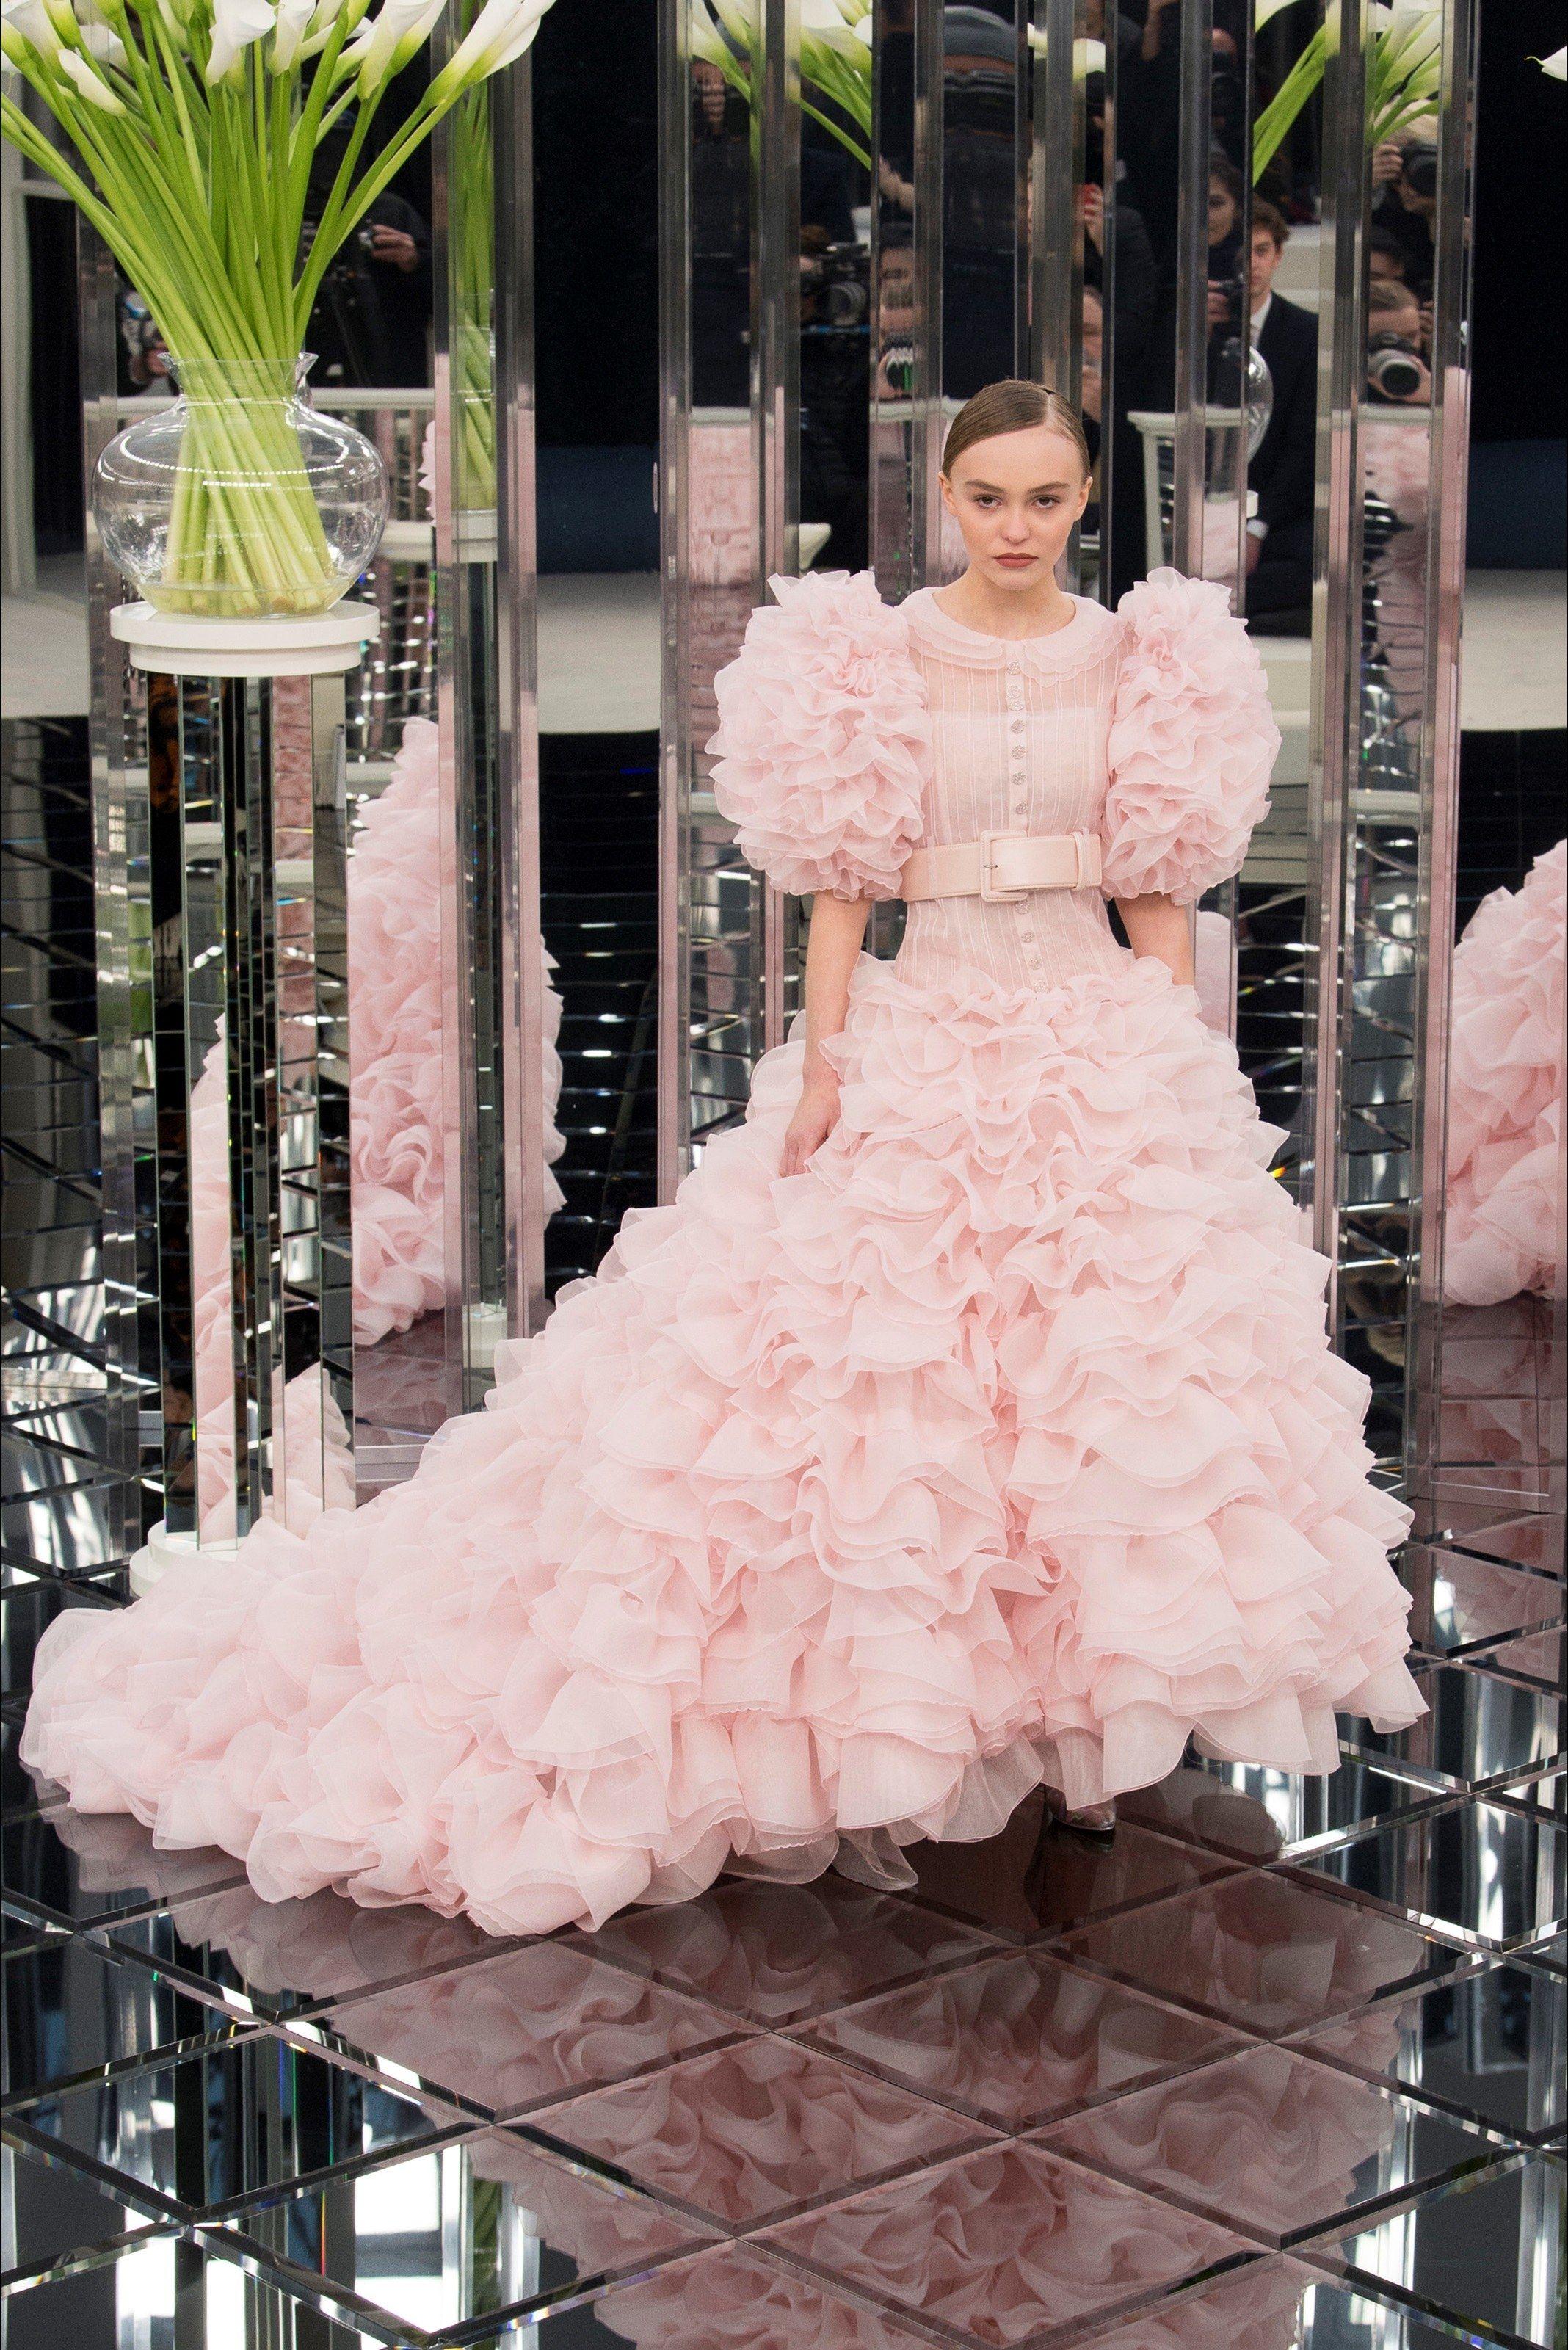 Vestiti Da Sposa Karl Lagerfeld.I Look Moda Piu Belli Disegnati Da Karl Lagerfeld Abiti Da Sposa